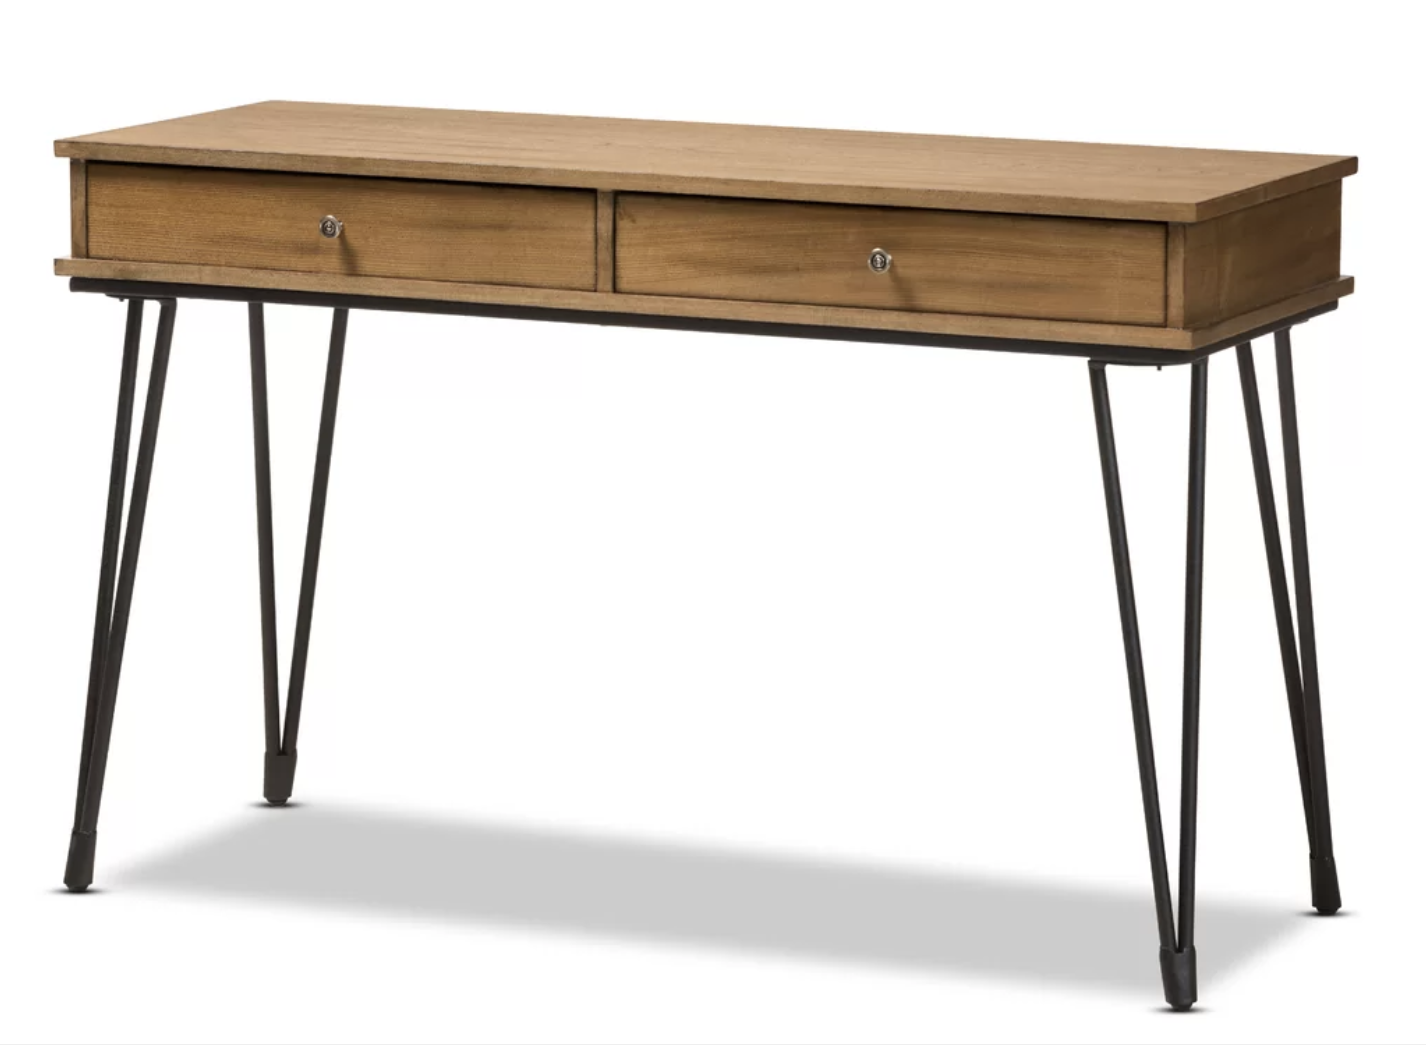 Office Furniture Modern Image By Kittredge Stephenson On Office Wood Writing Desk Contemporary Desk